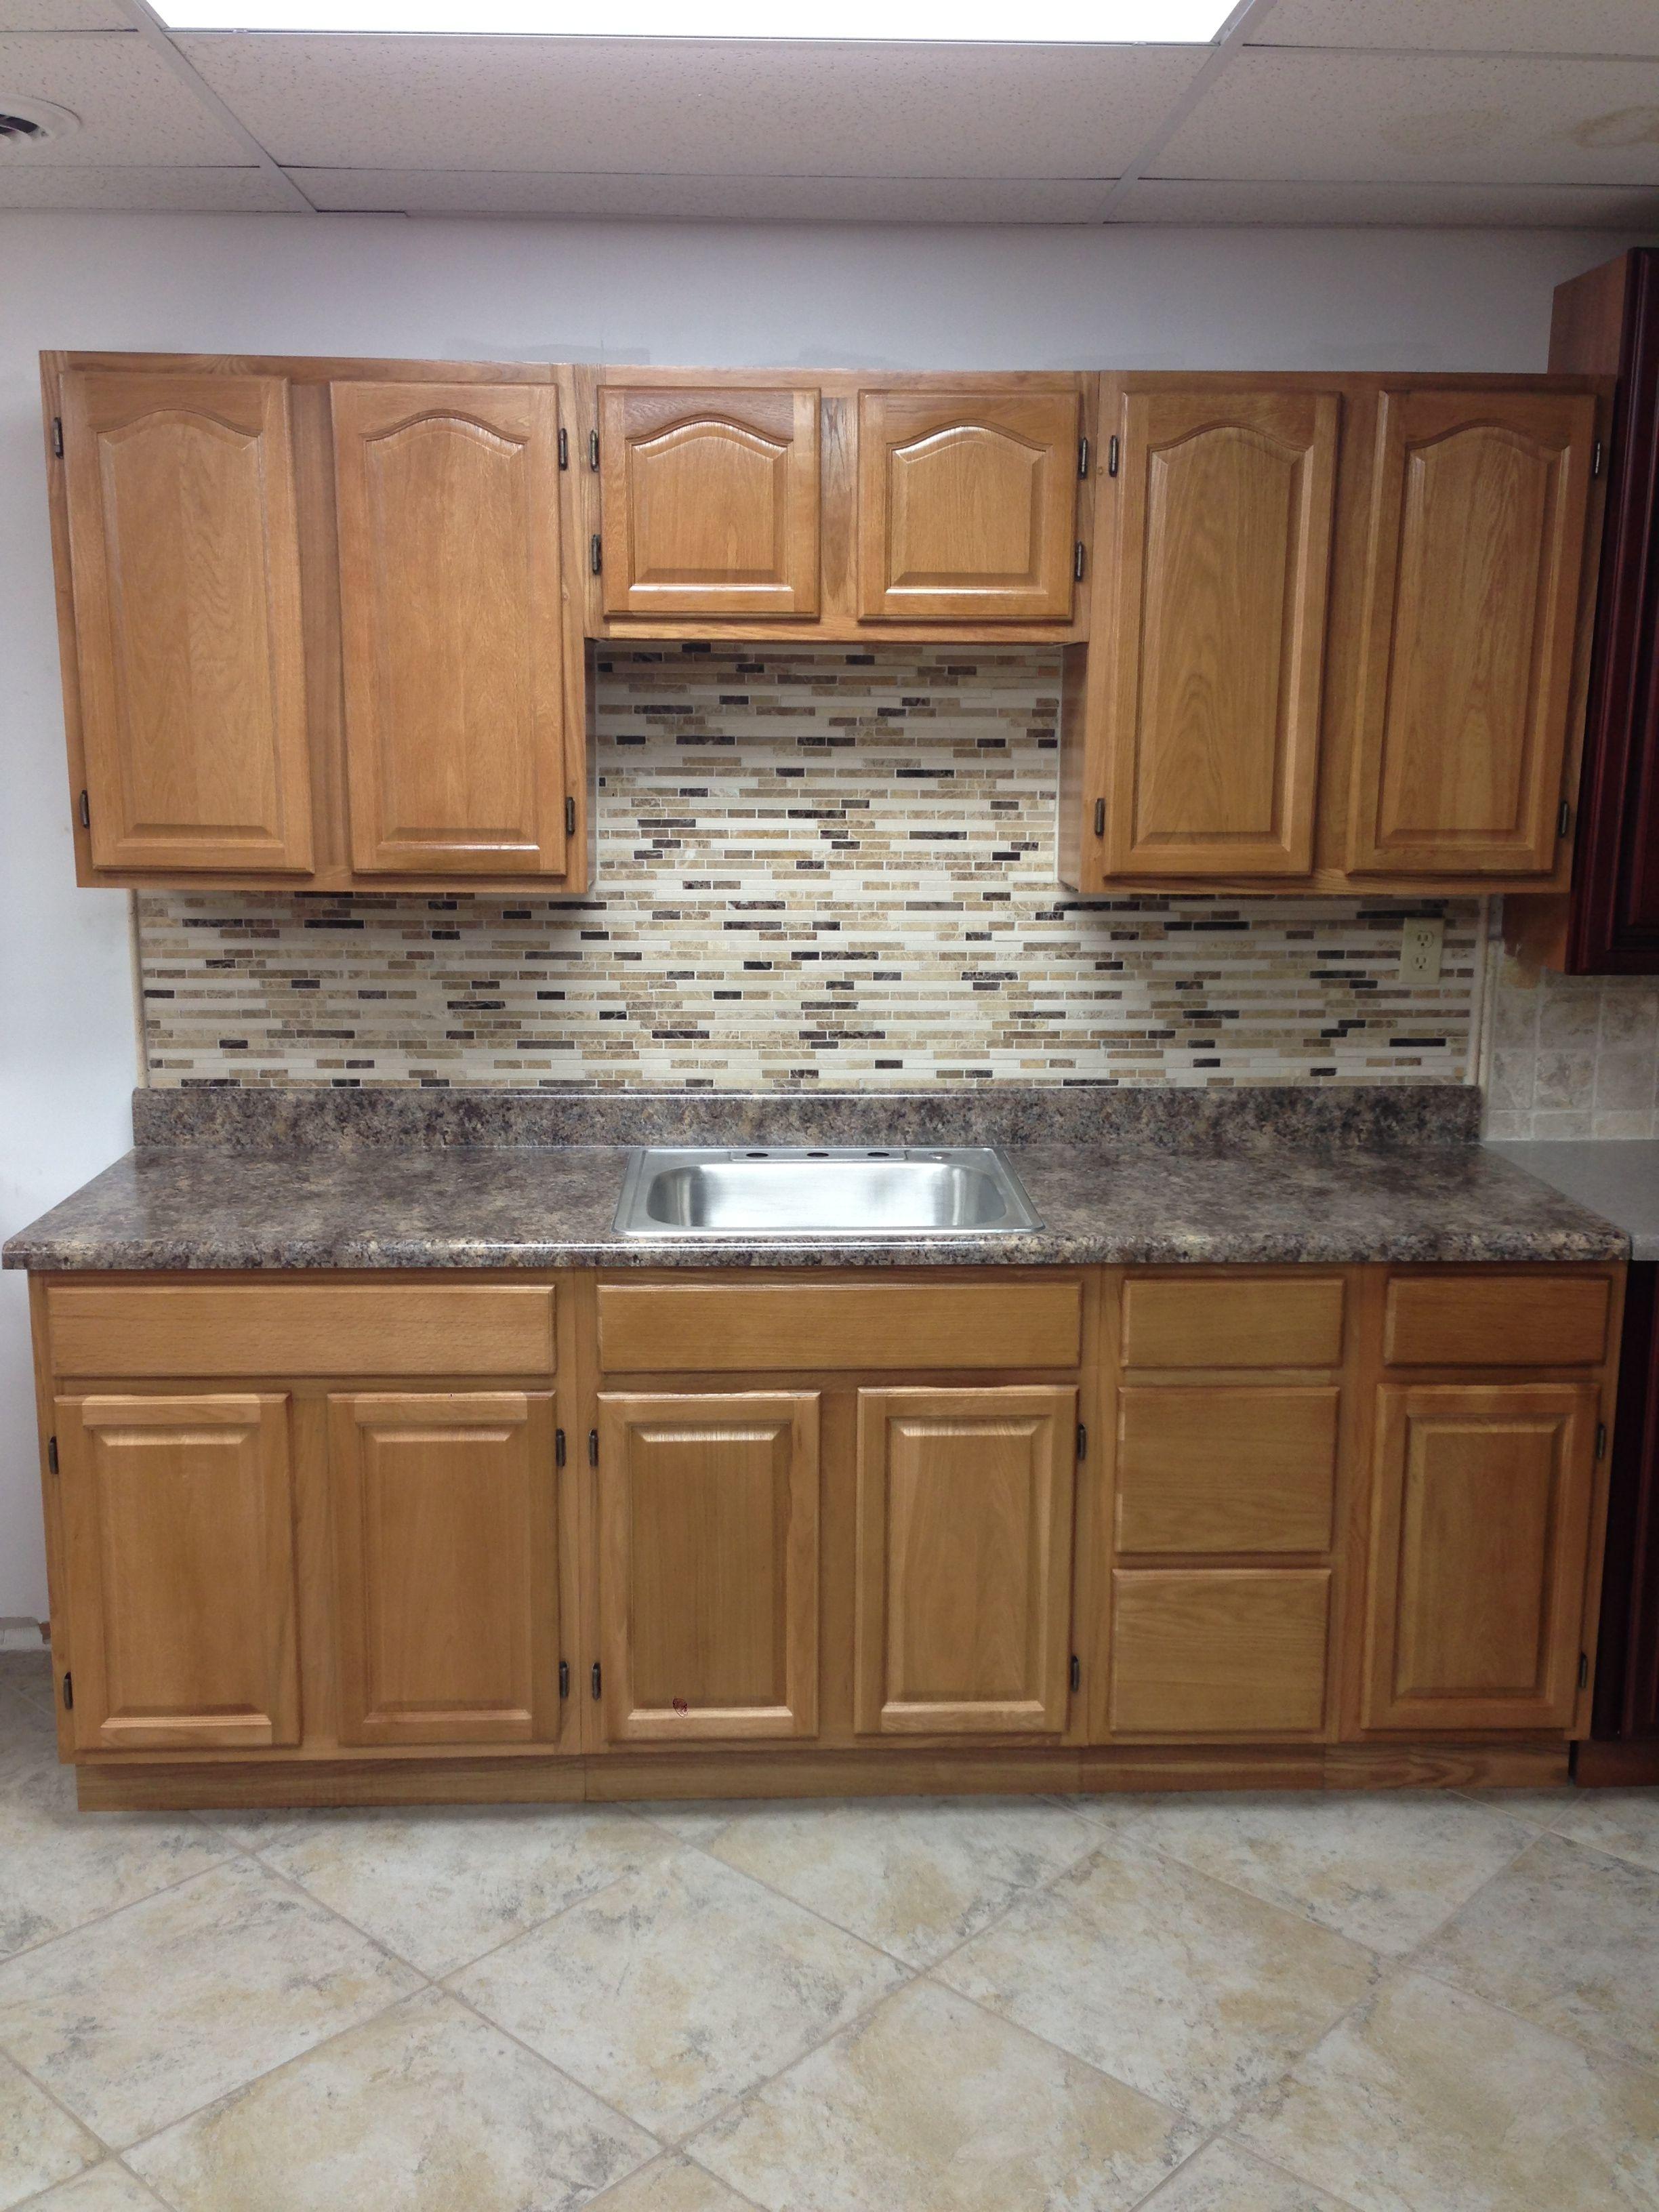 Kitchen Flooring With Honey Oak Cabinets